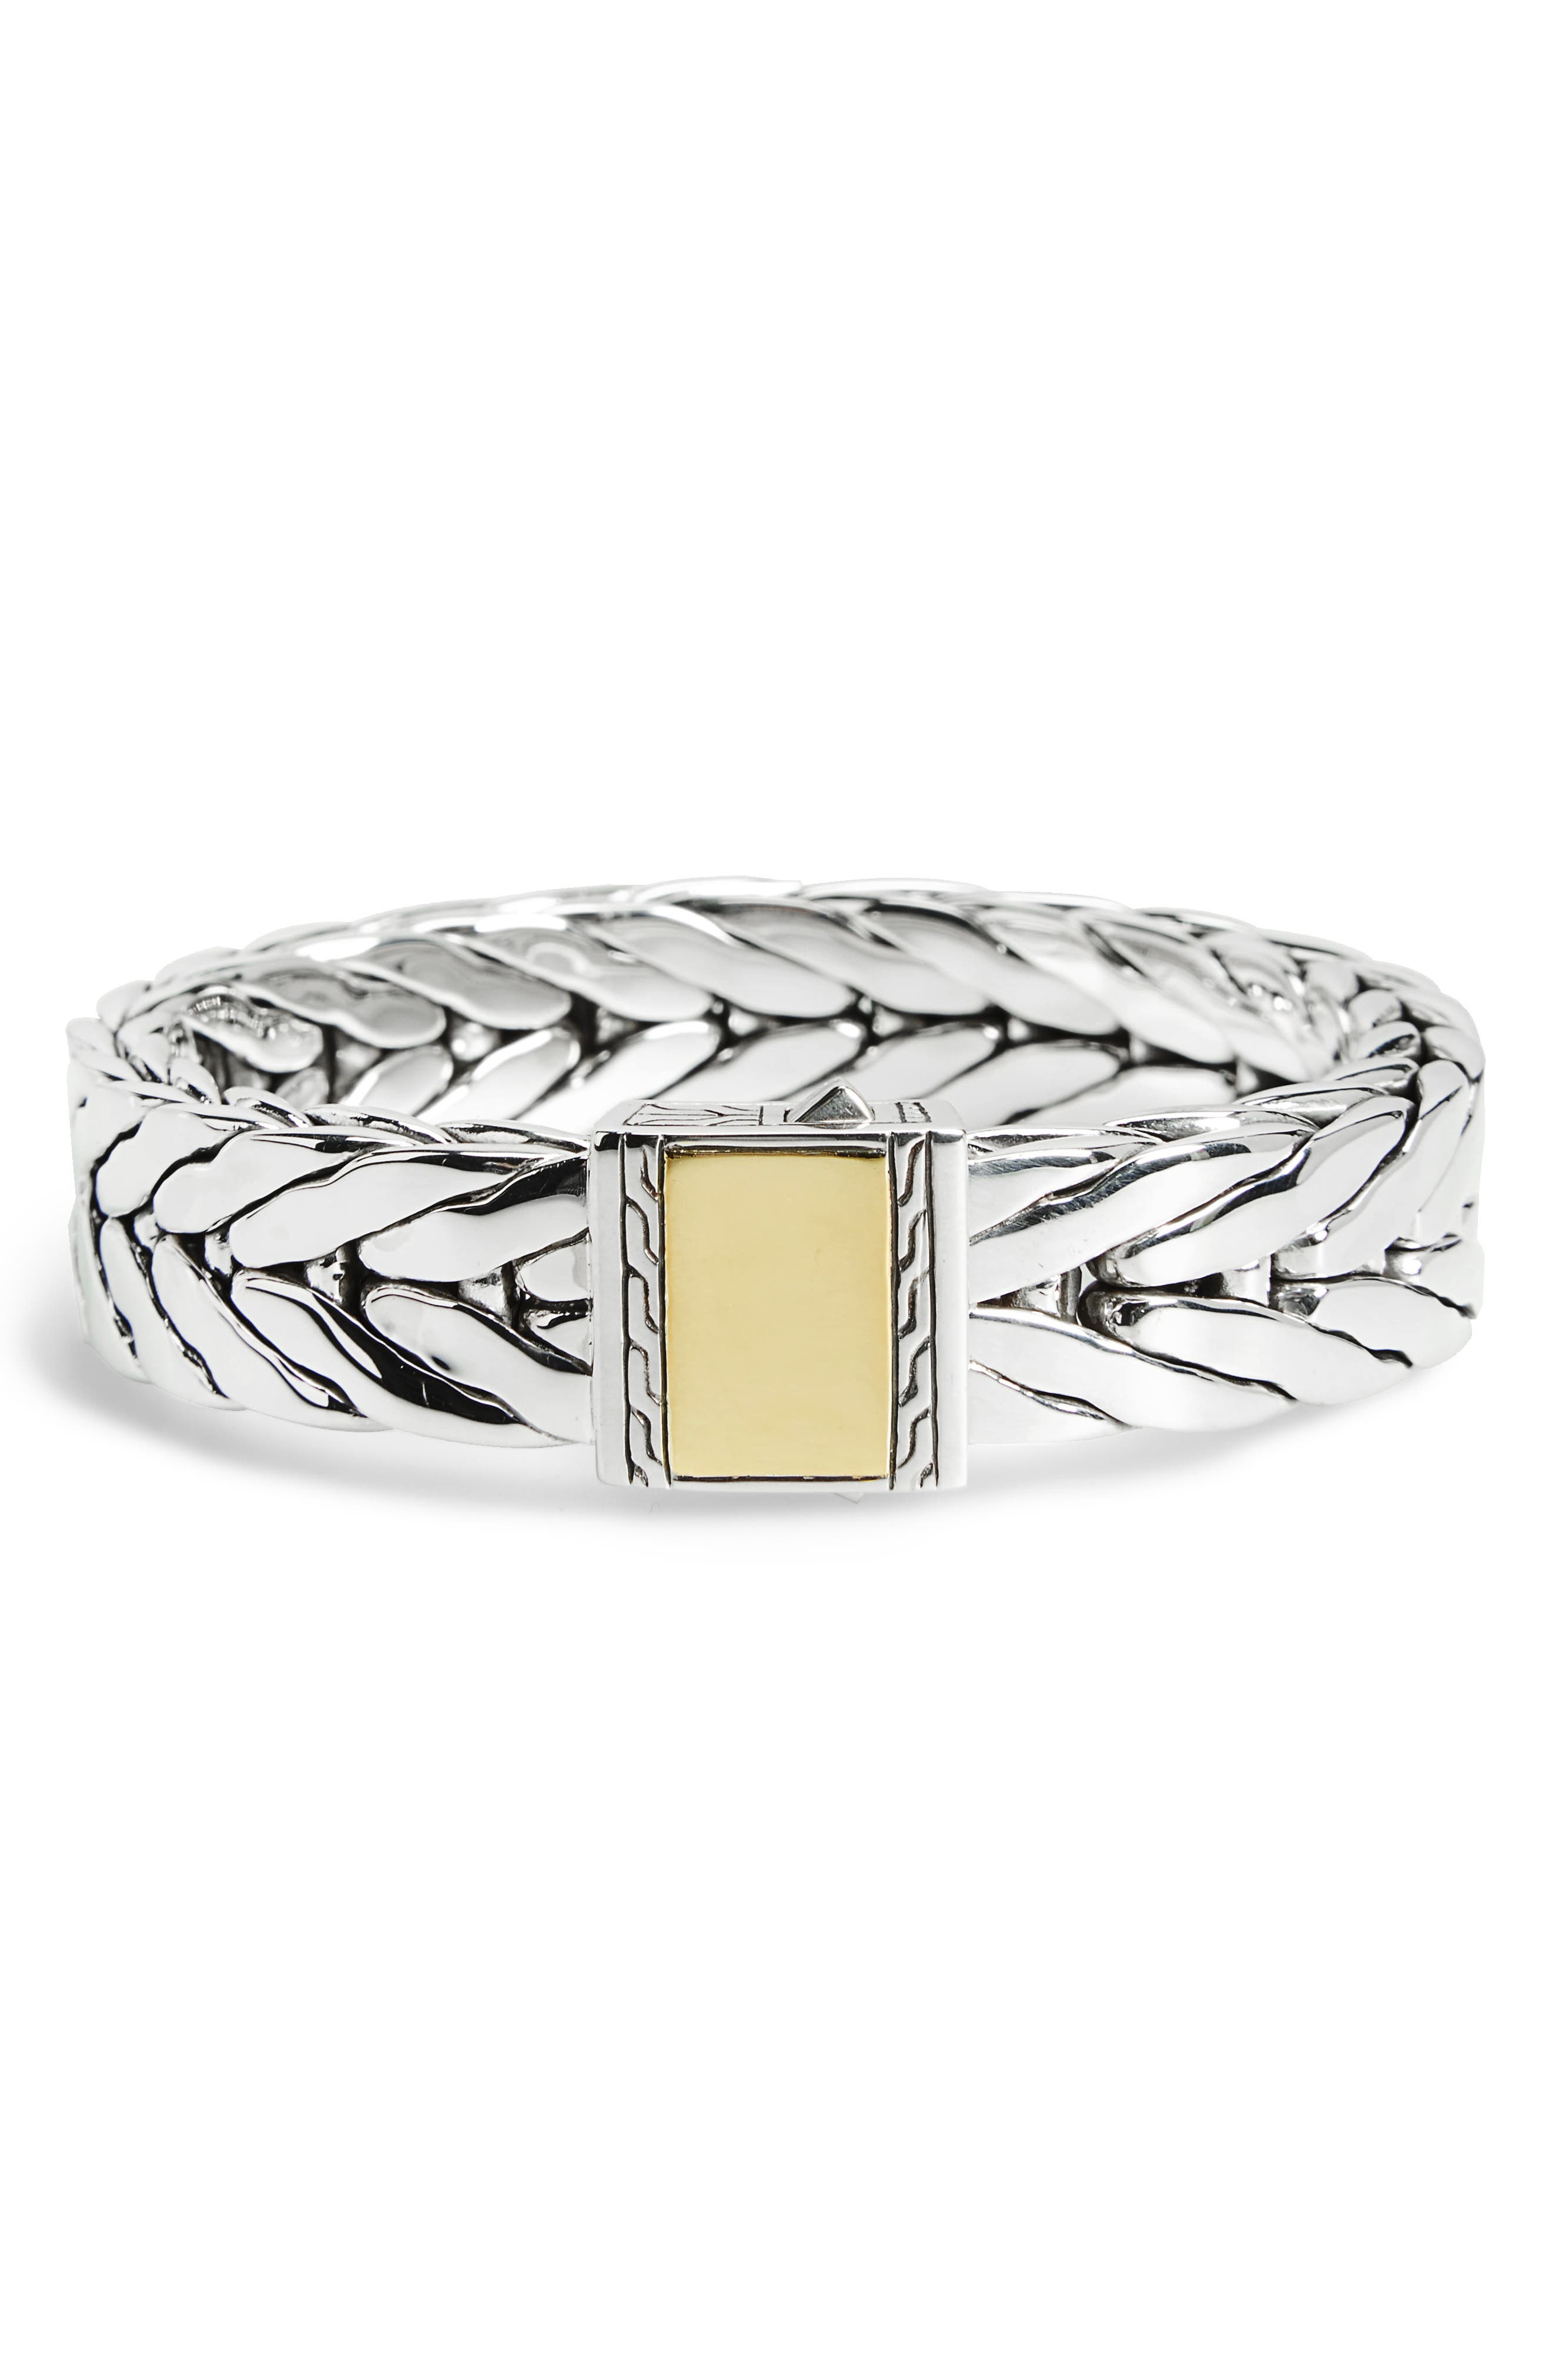 Main Image - John Hardy Modern Chain Extra Large Chain Bracelet